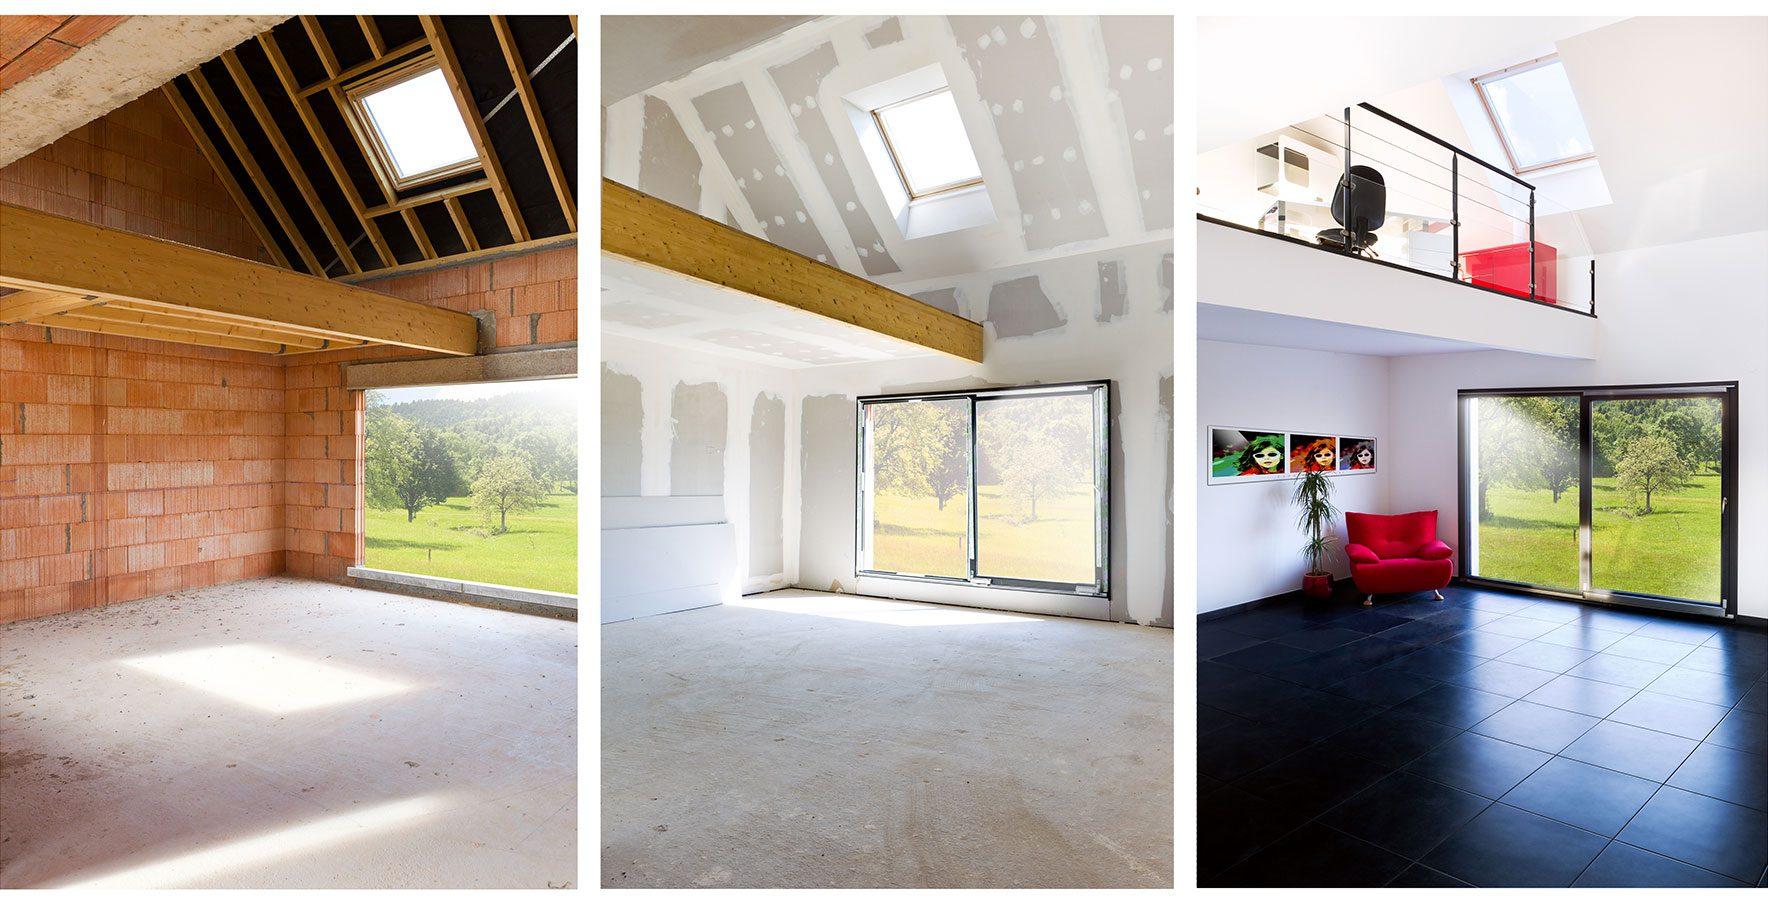 prt rnovation maison latest pret renovation maison with. Black Bedroom Furniture Sets. Home Design Ideas